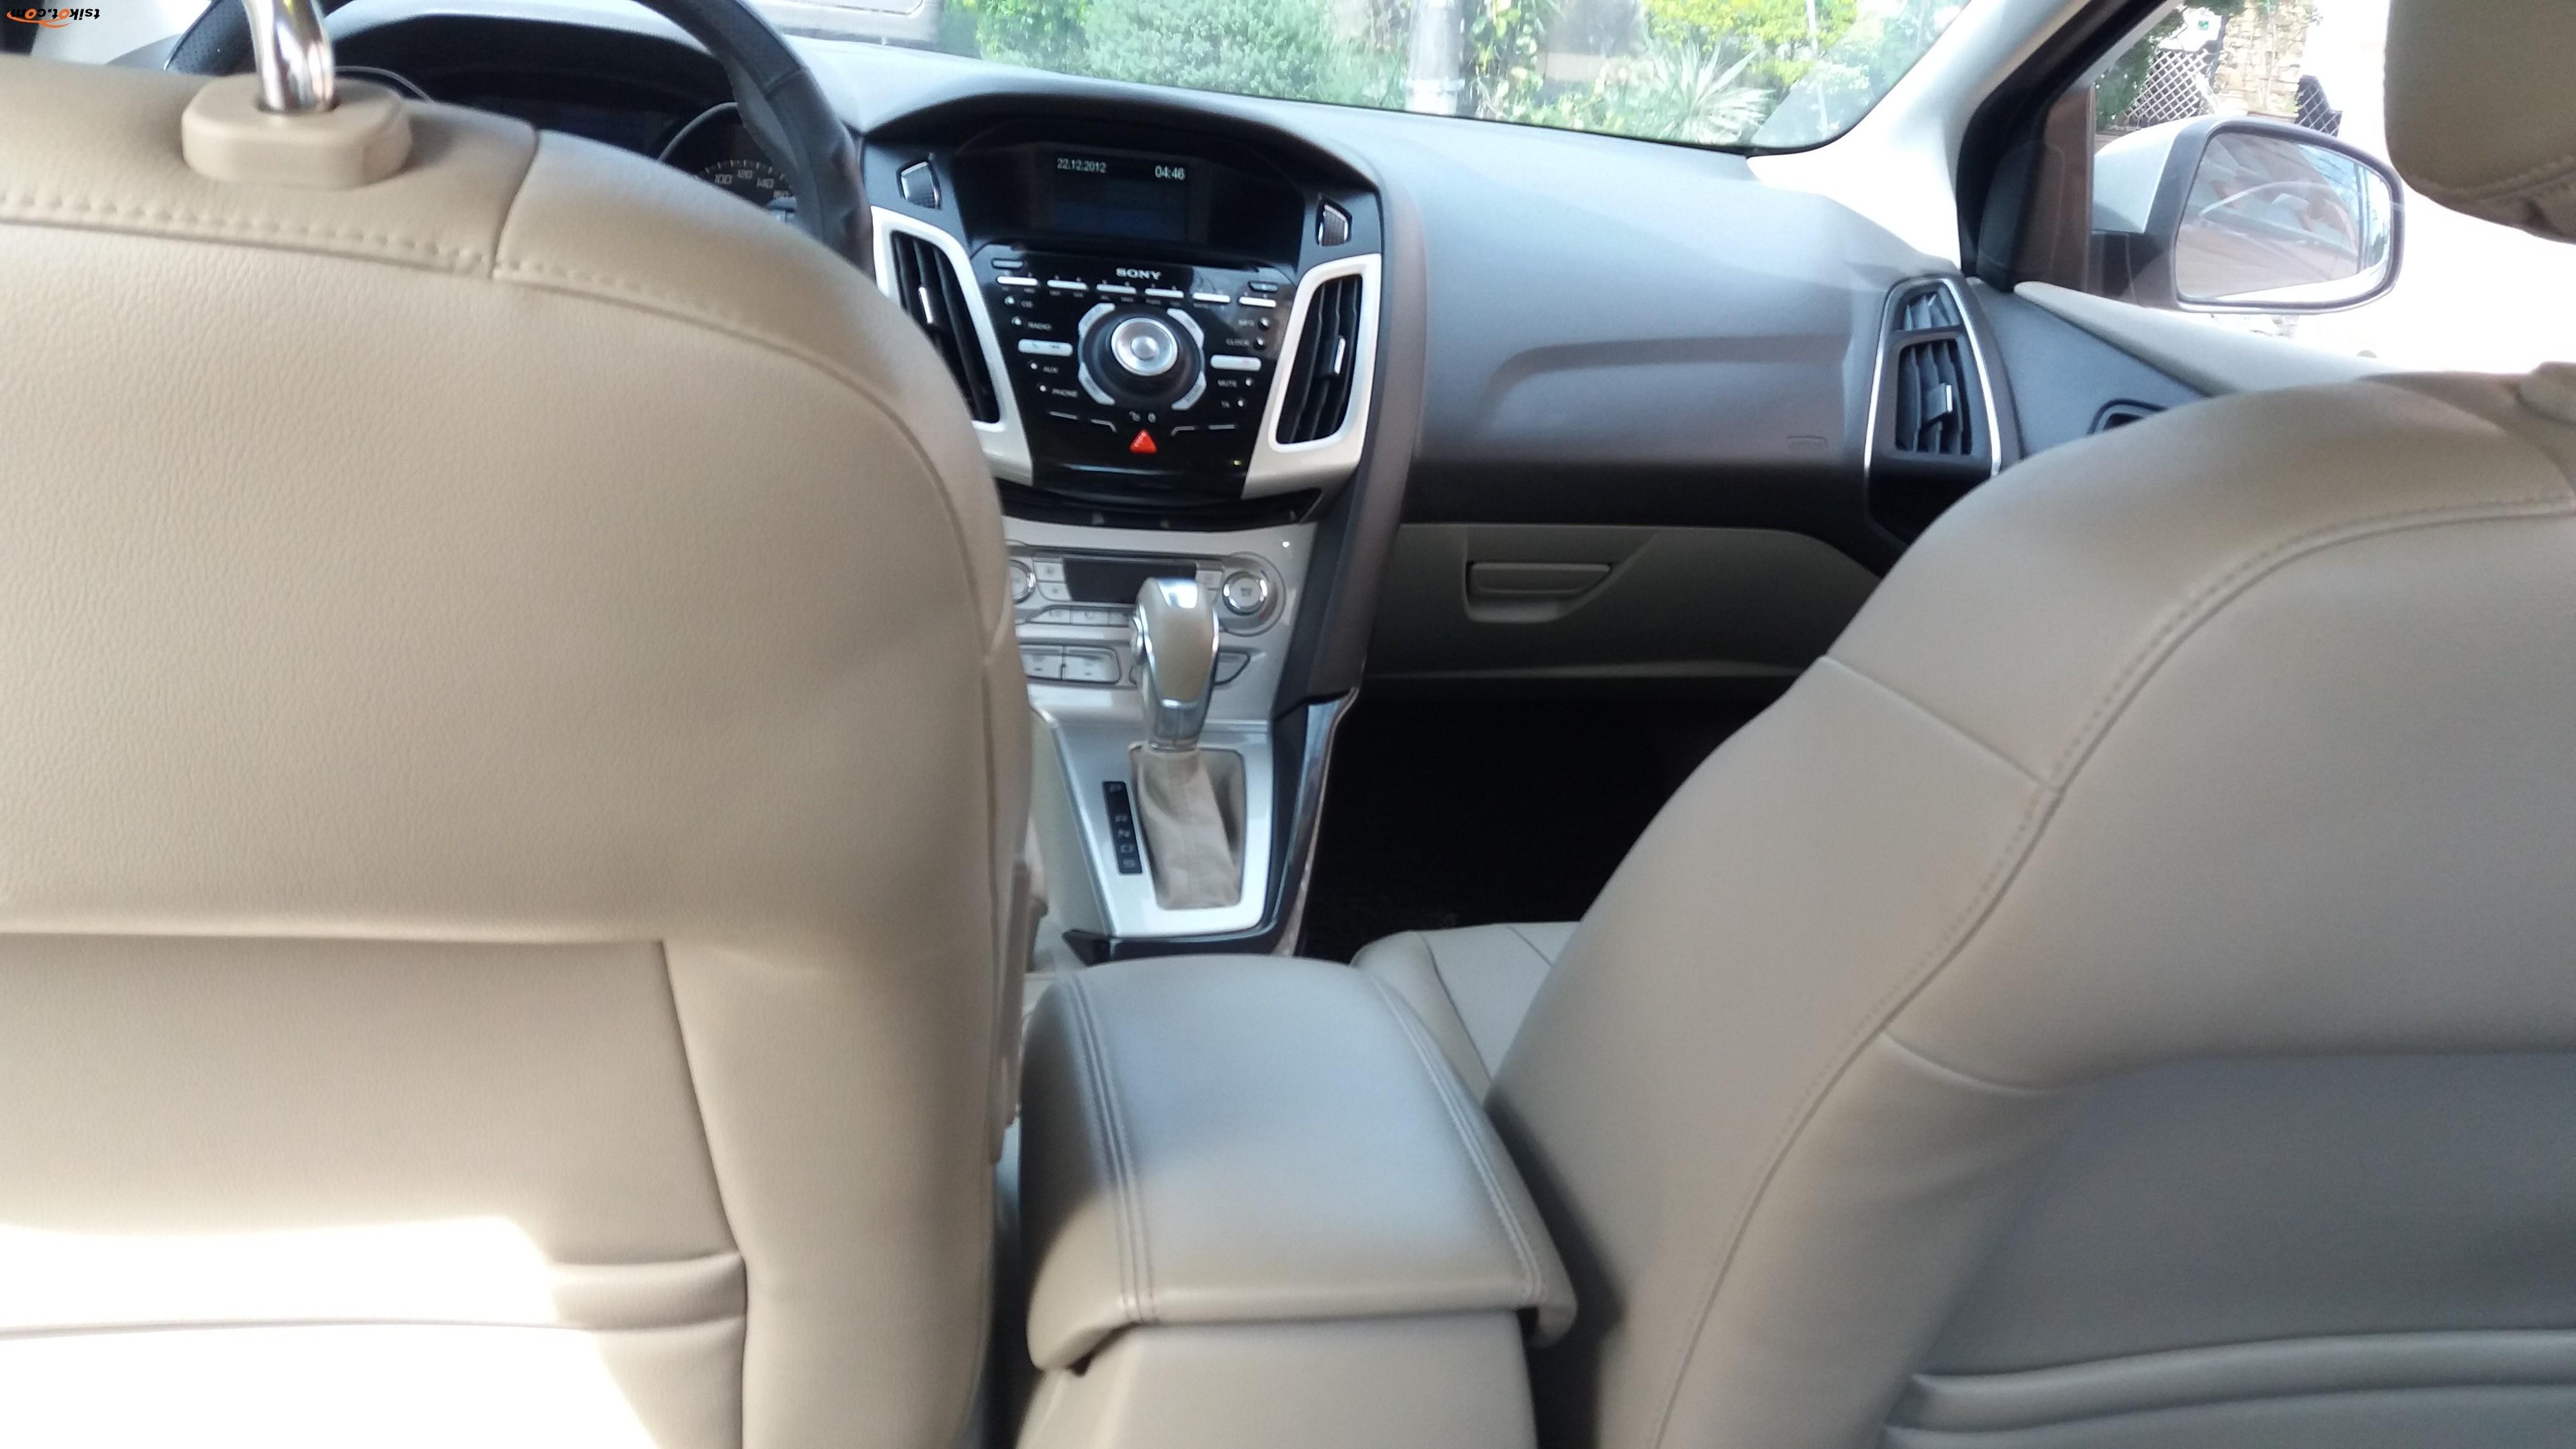 Ford Focus 2014 - 10